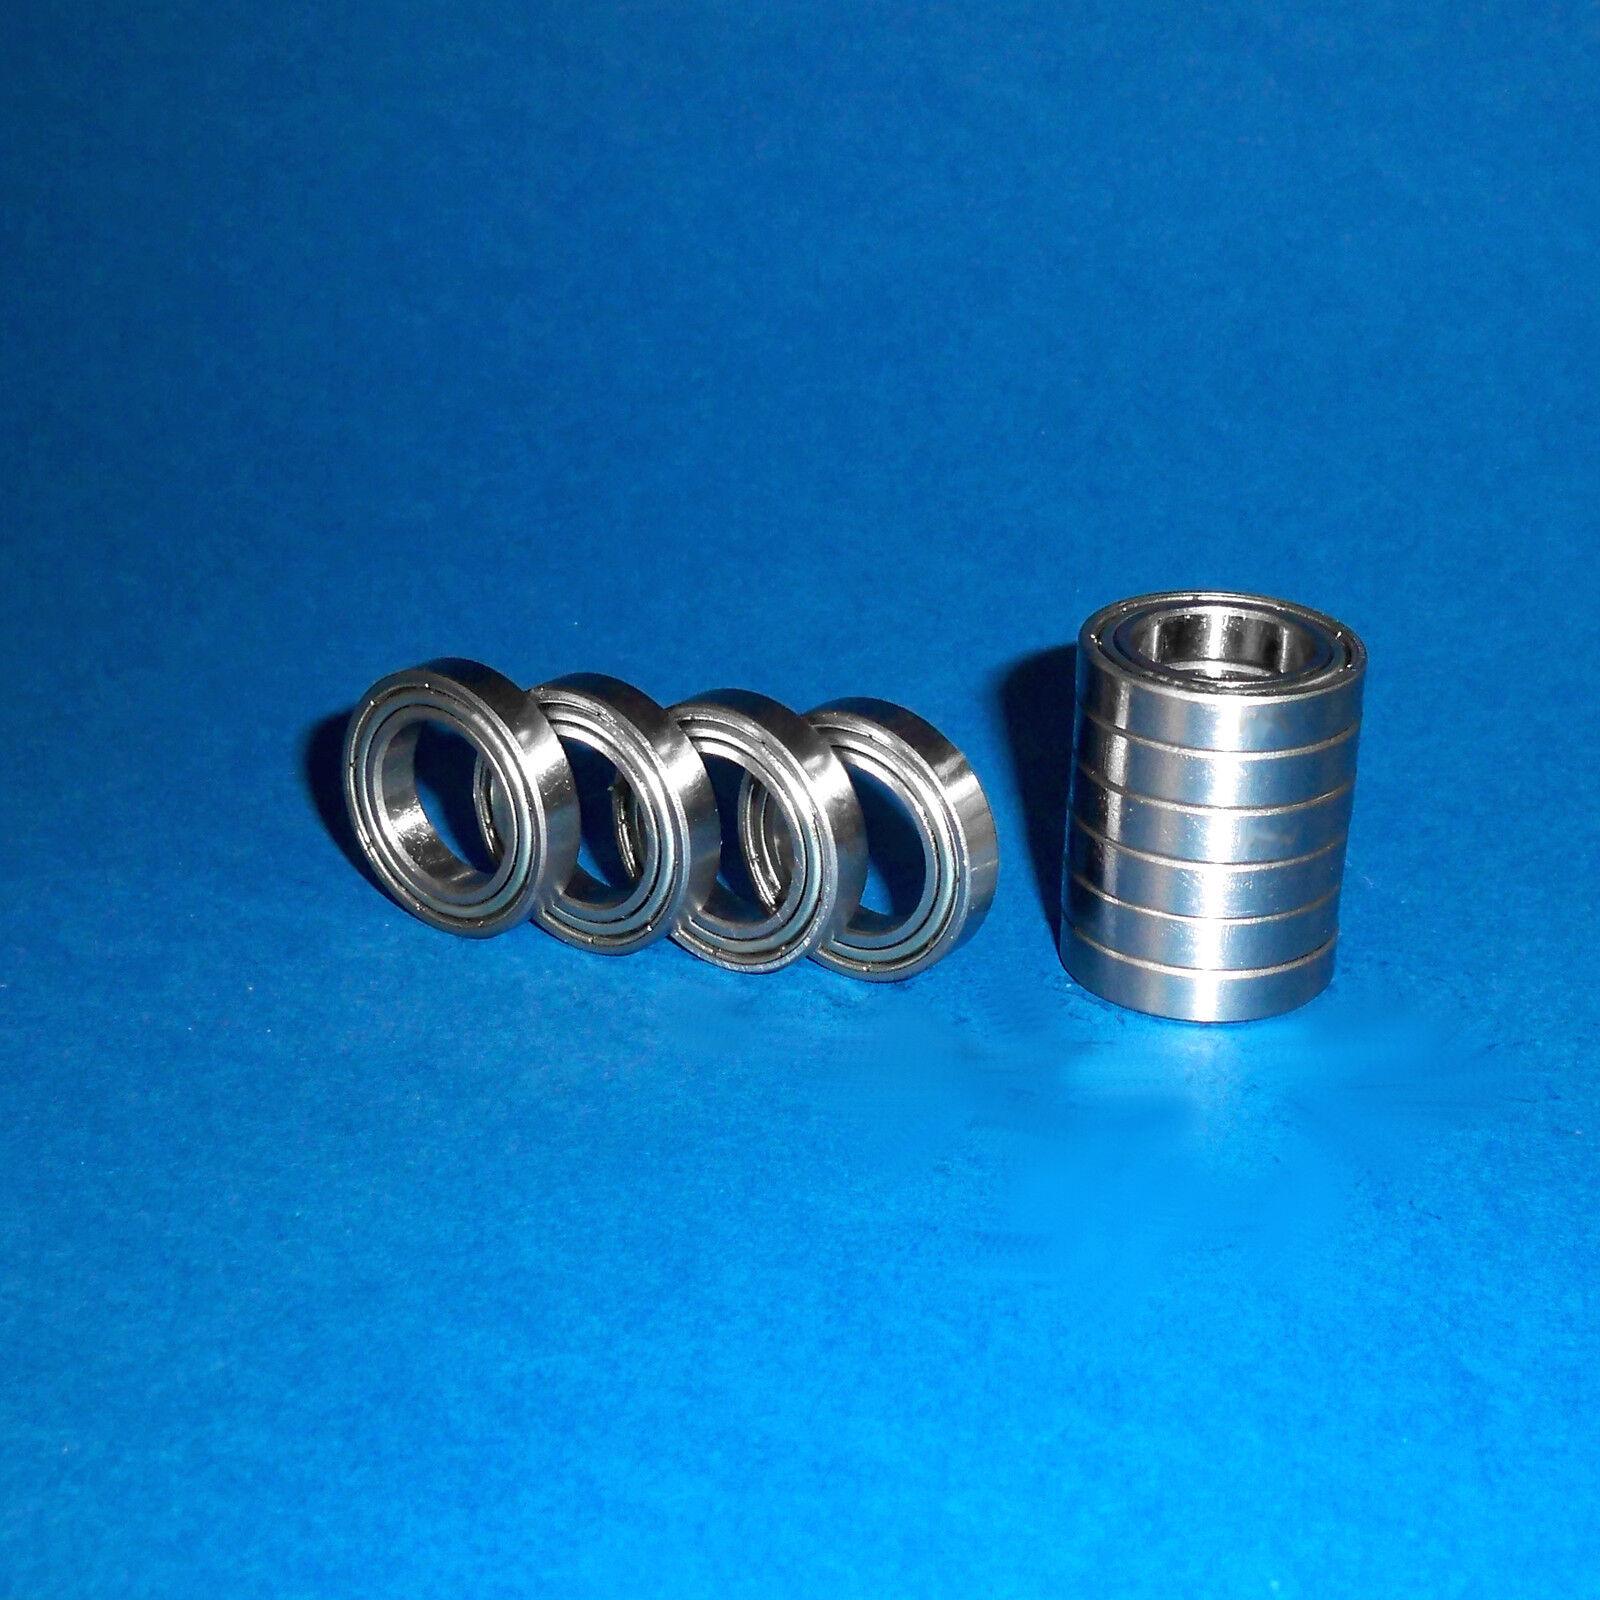 IBU Rillenkugellager Kugellager 6903 ZZ = 61903 2Z  17x30x7 mm 4 Stk